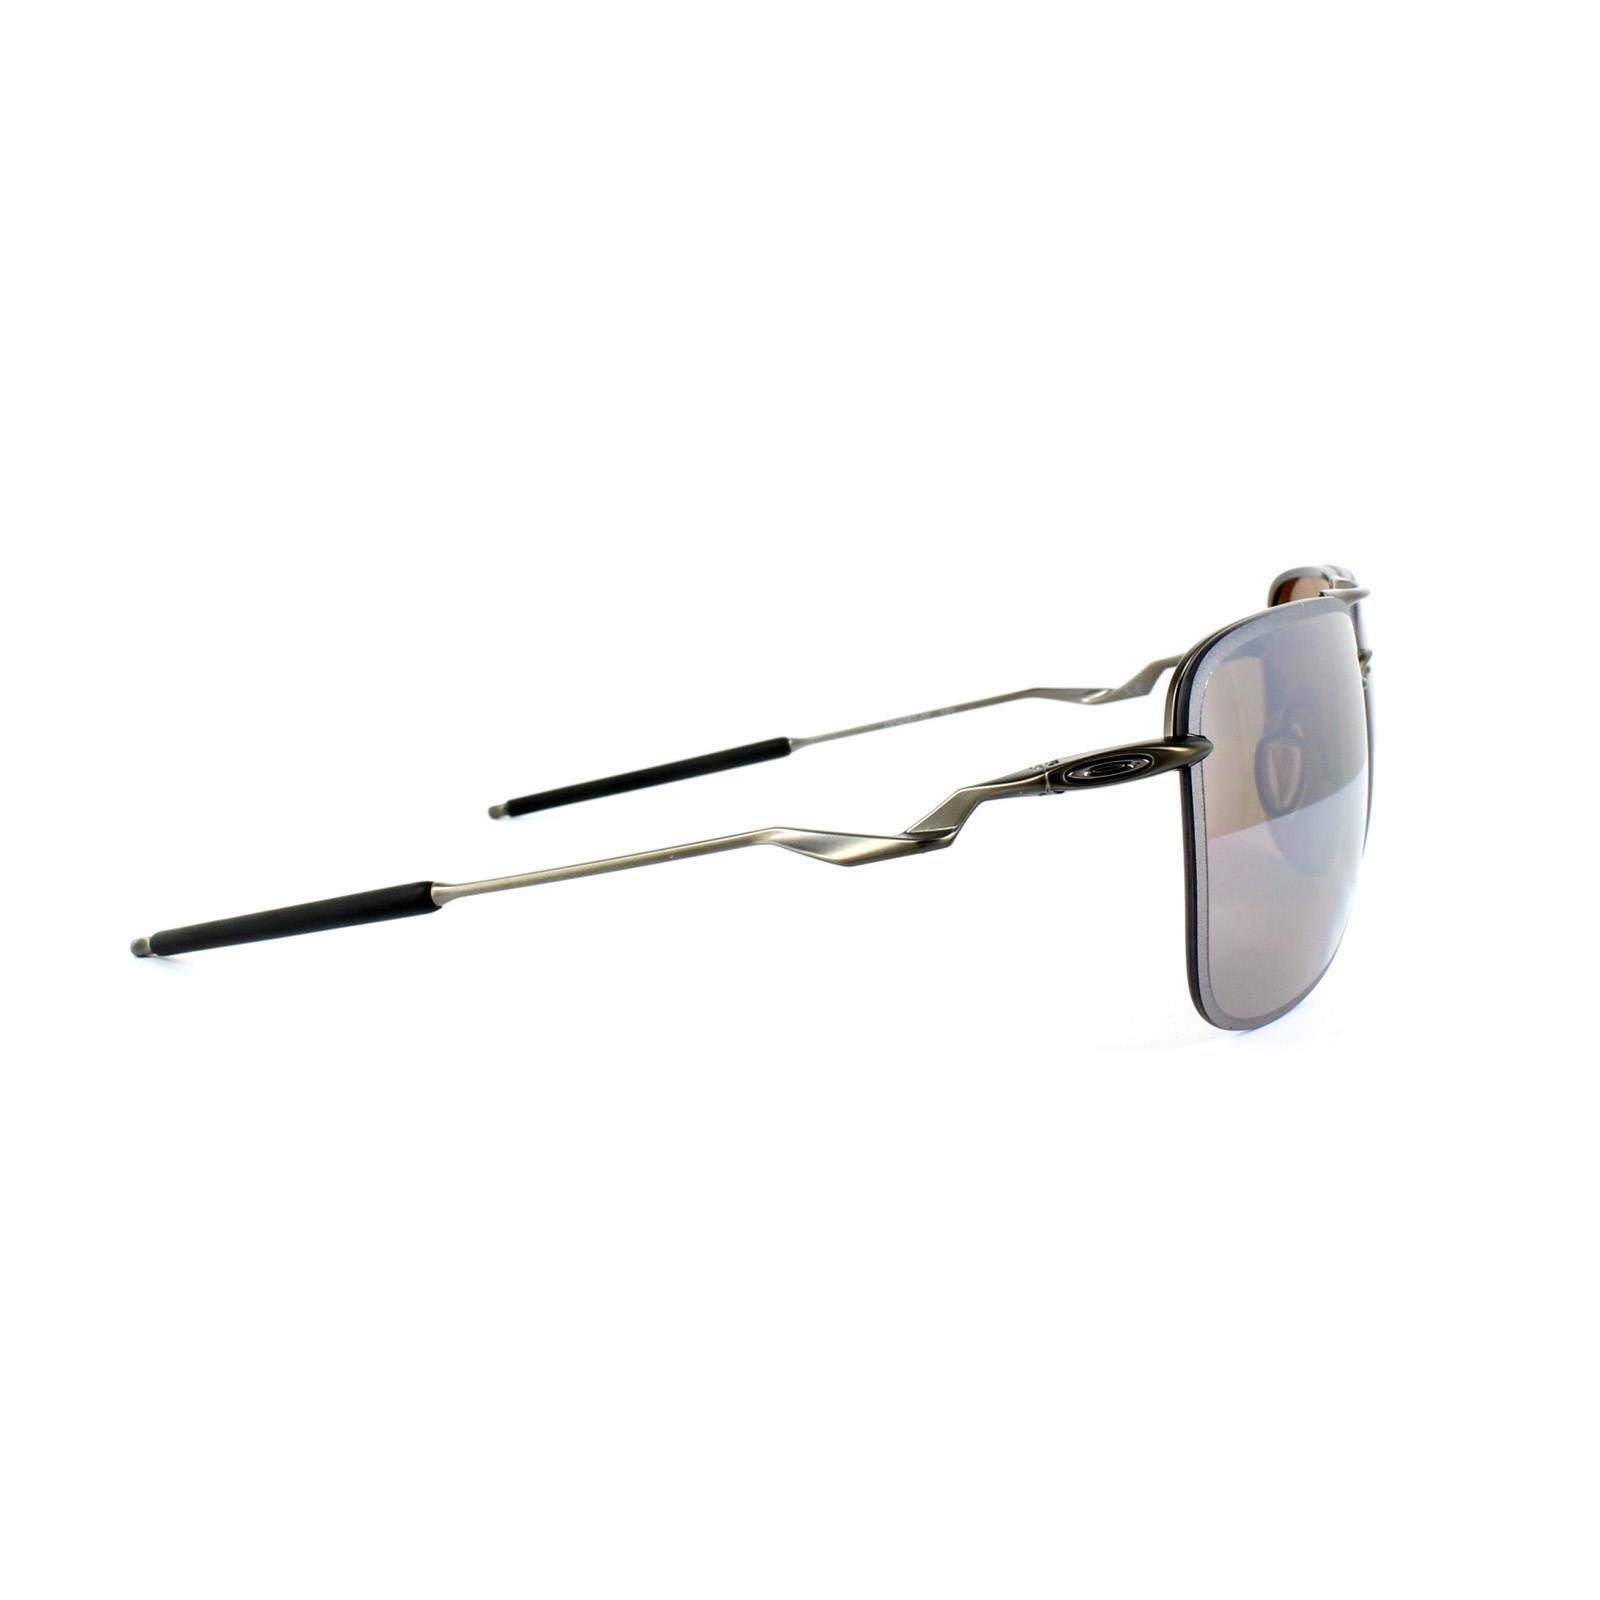 bfd4584280 Sentinel Oakley Sunglasses Tailhook OO408707 Titanium Titanium Iridium  Polarized